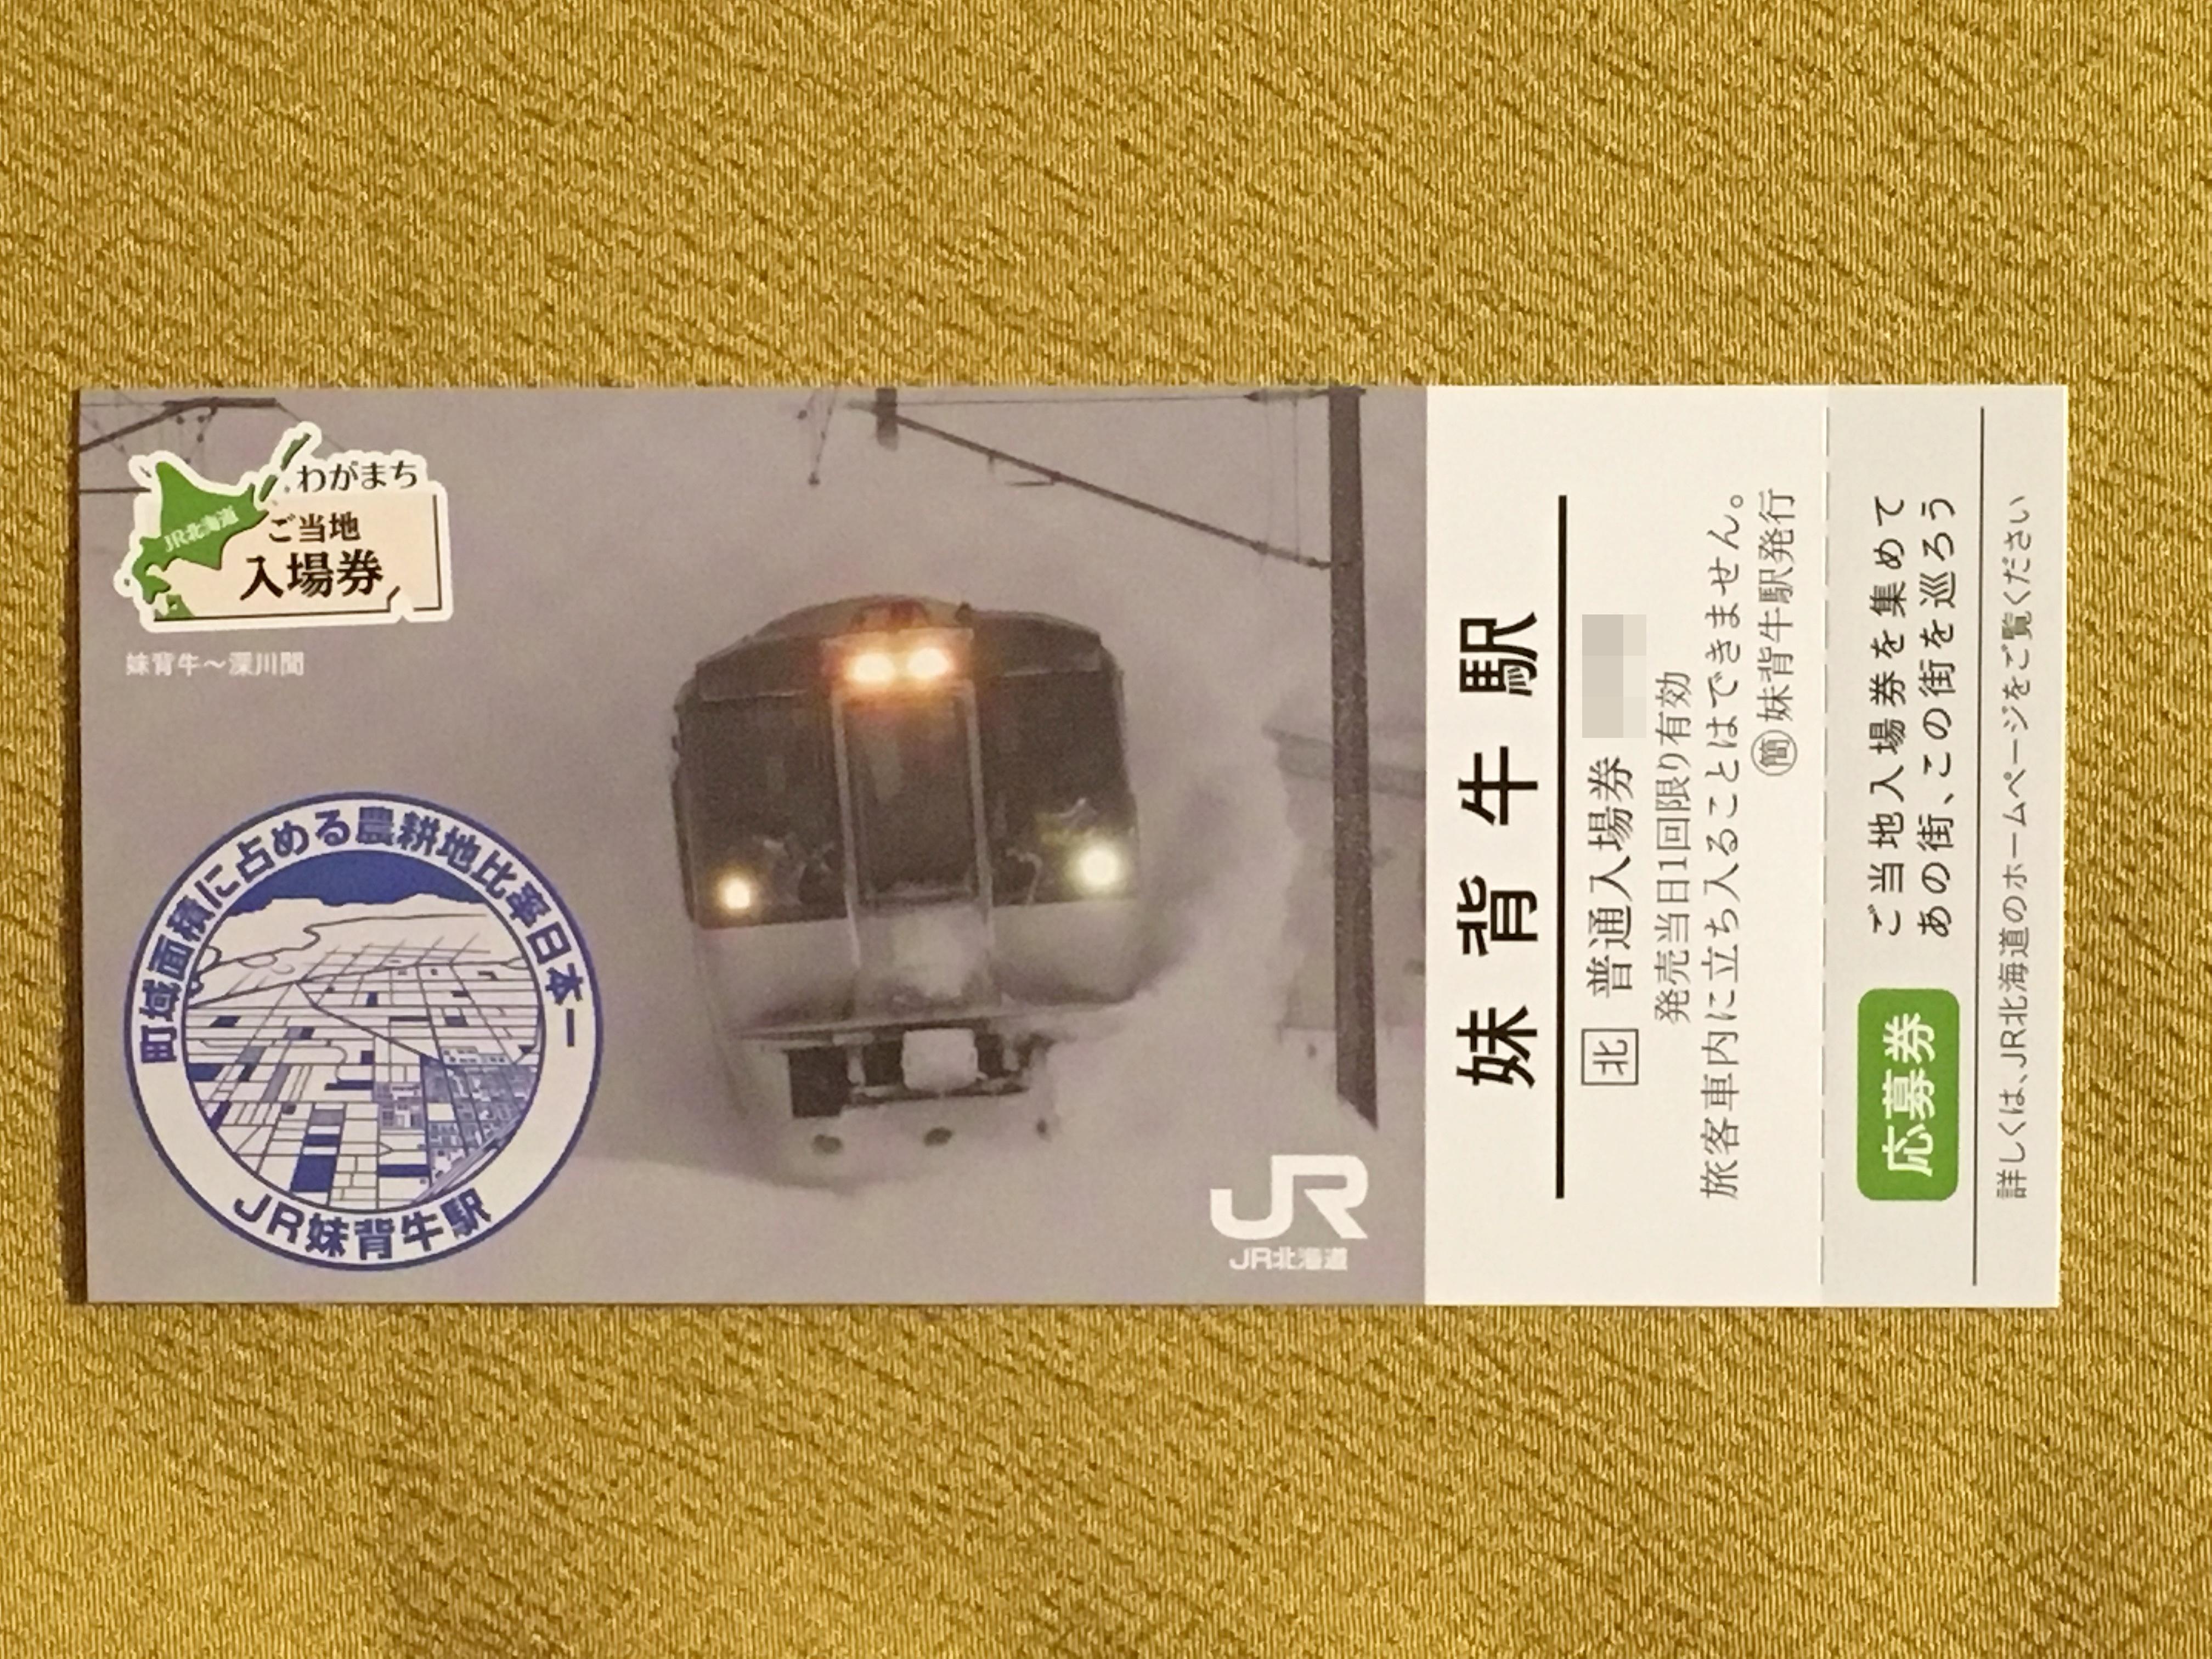 JR北海道ご当地入場券 妹背牛駅表.JPG